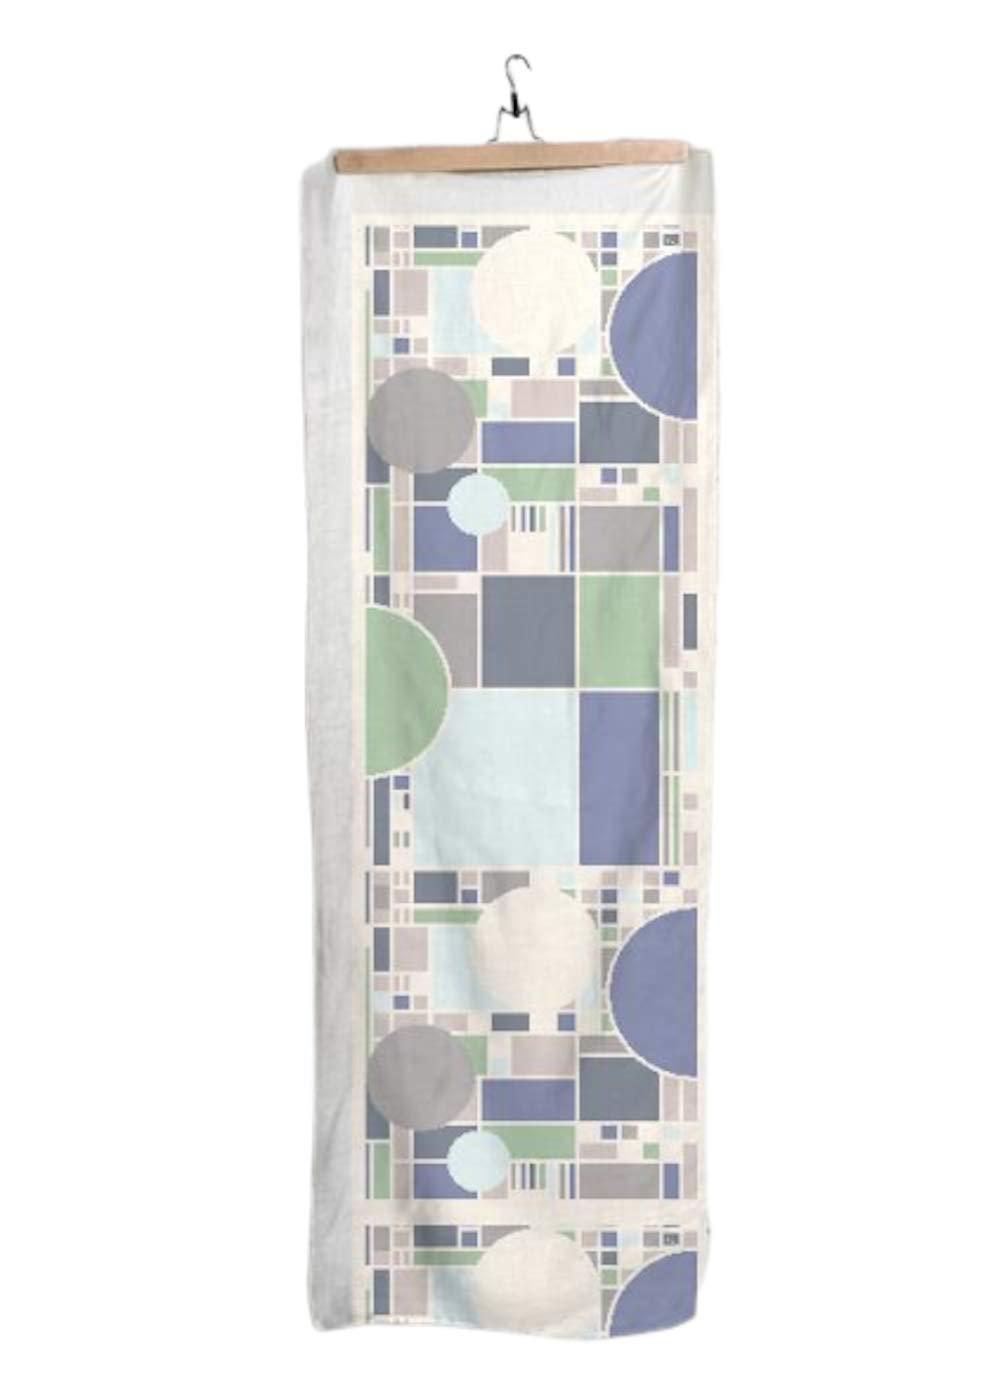 VIDA Coonley Seaglass Modal Scarf 28'' × 78'' | Original Artwork by Frank Lloyd Wright | Custom Made to Order